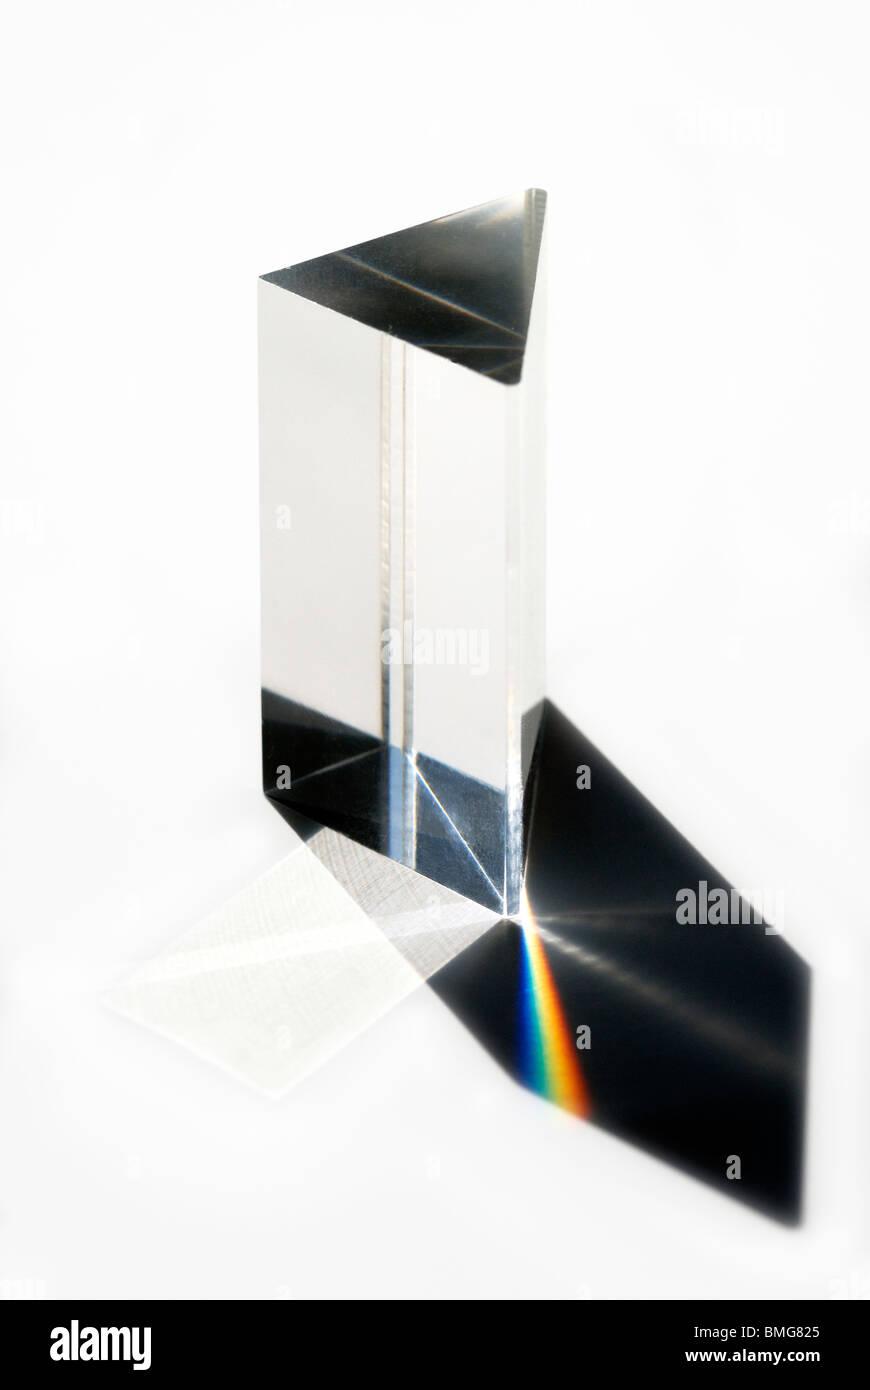 Triangular Prism - Stock Image